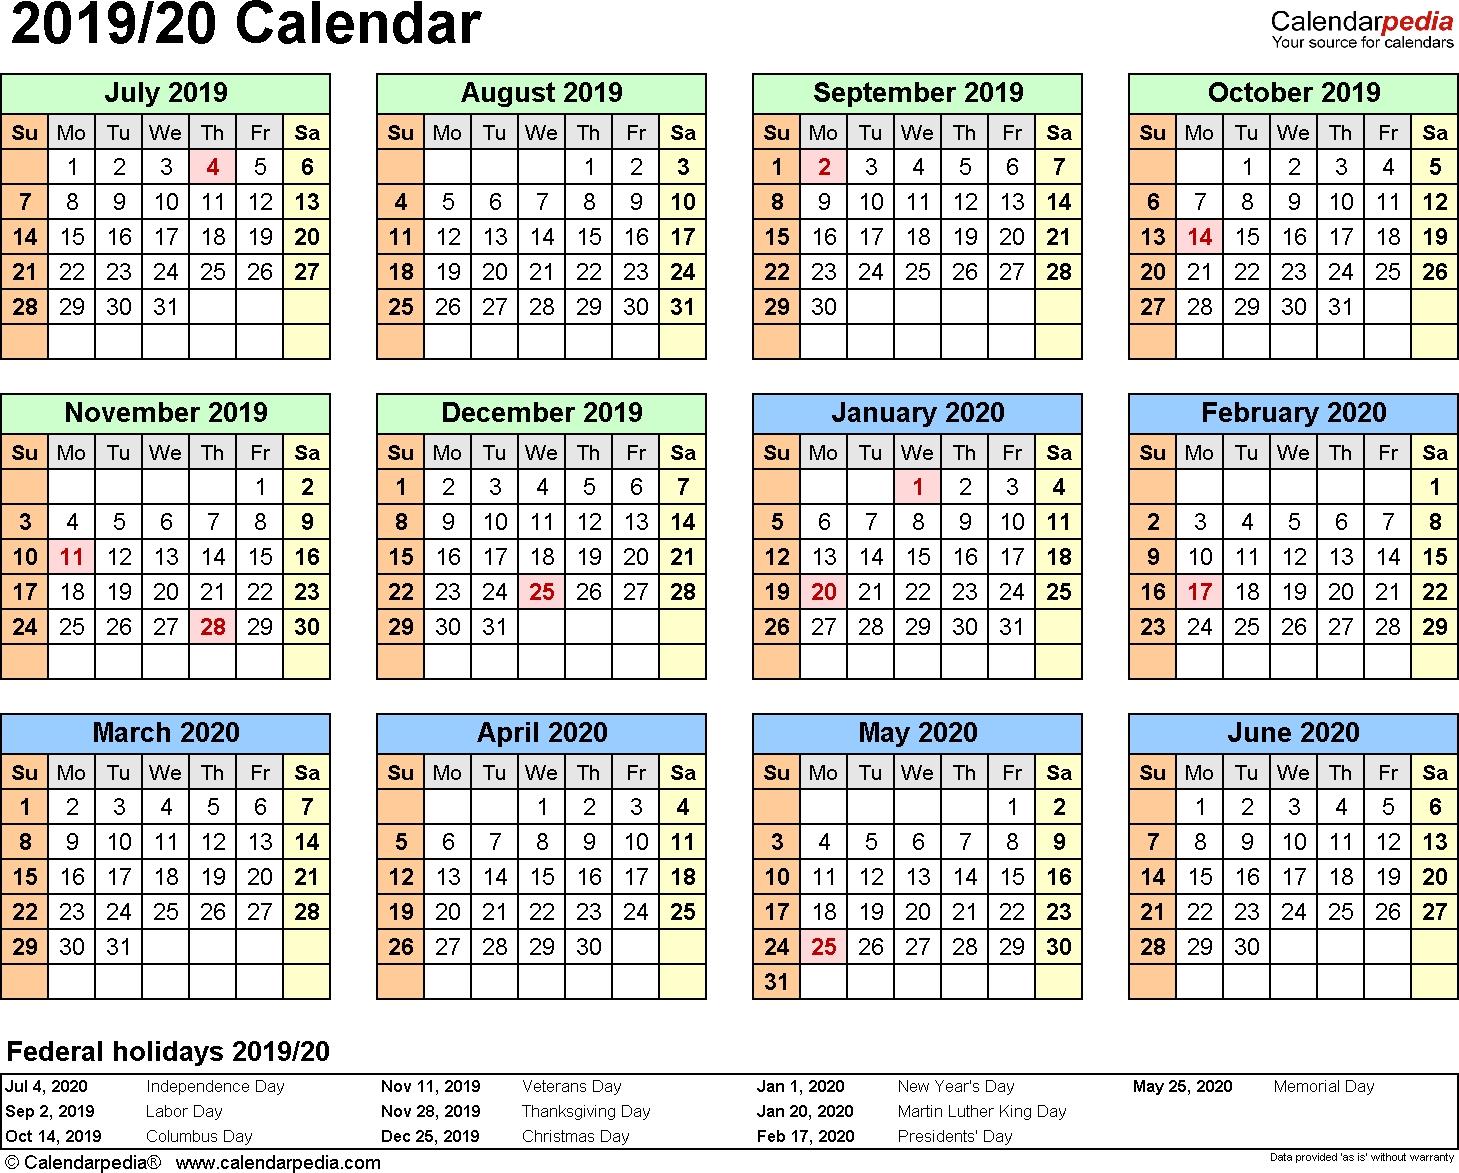 Split Year Calendars 2019/2020 (July To June) - Pdf Templates regarding 2019 2020 Financial Year Calendar